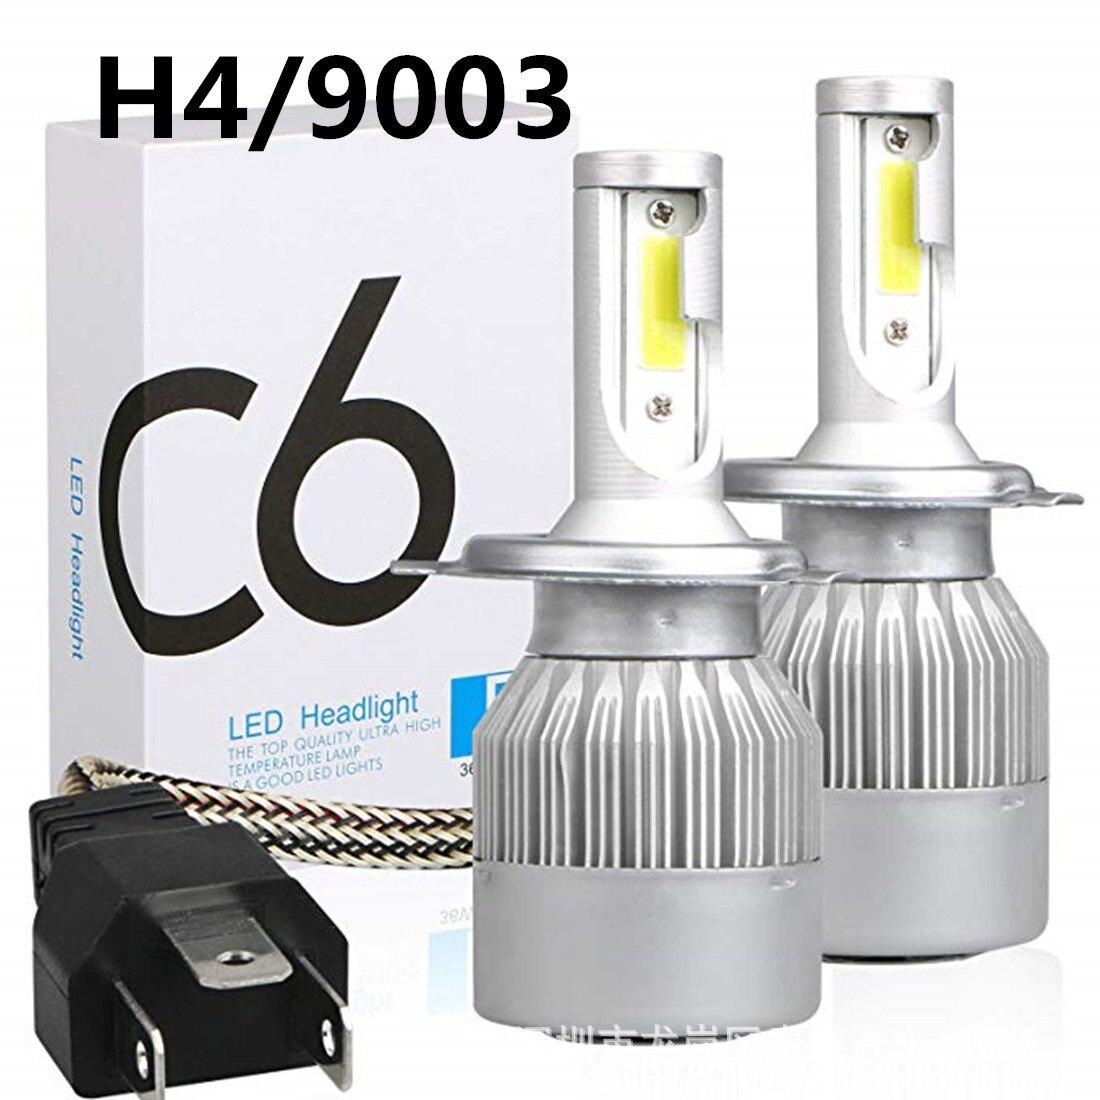 C6 H1 H3 Car Led Headlight Bulbs H7 LED Car Lights H4 880 H11 HB3 9005 HB4 9006 H13 6000K 72W 12V 7600LM Auto Headlamps 4